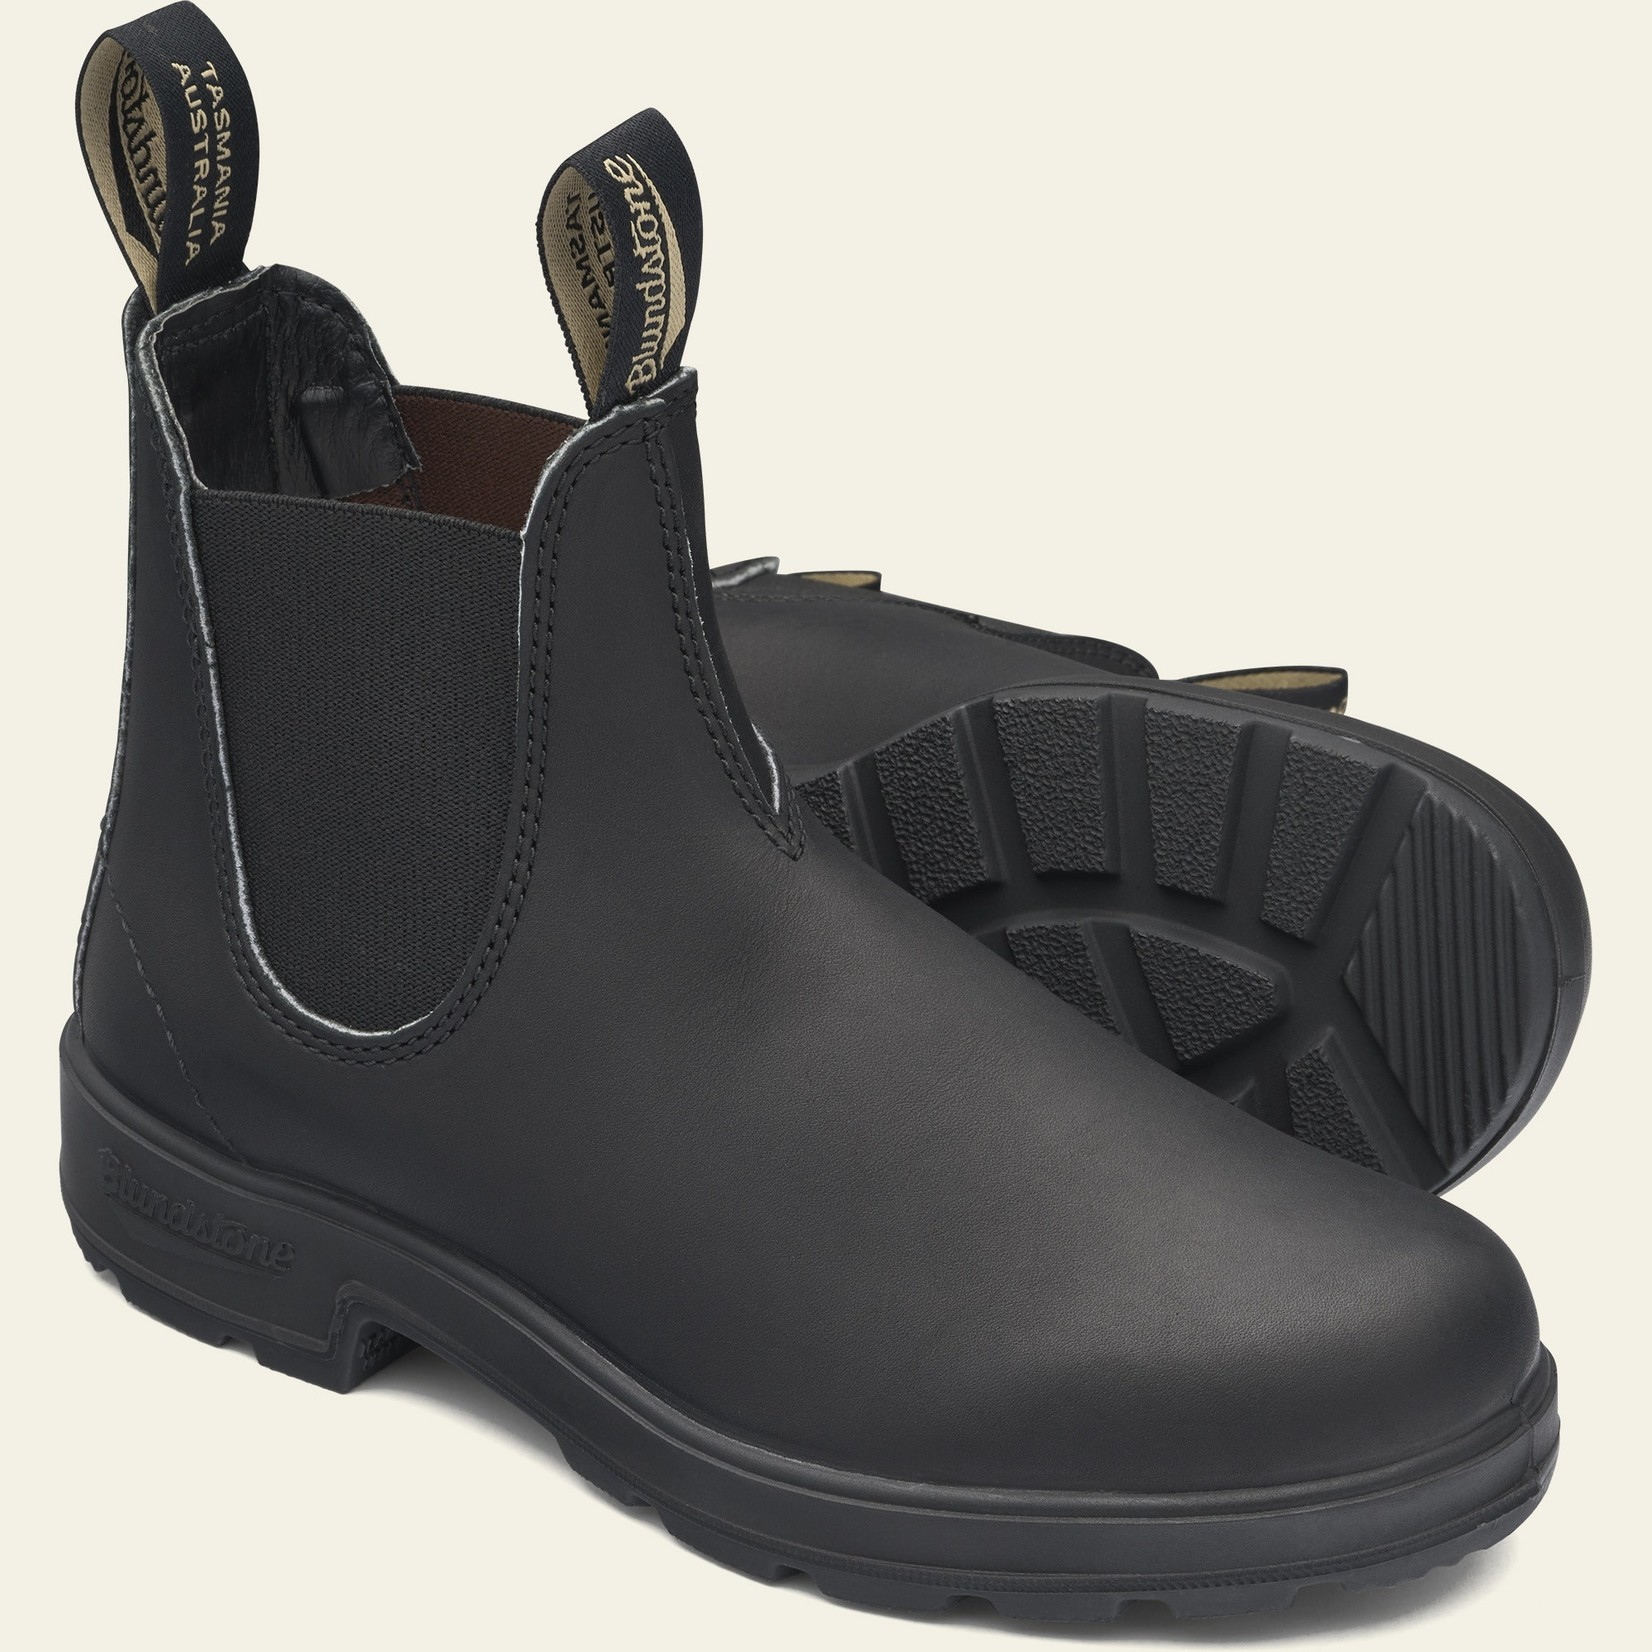 Blundstone 510 Black